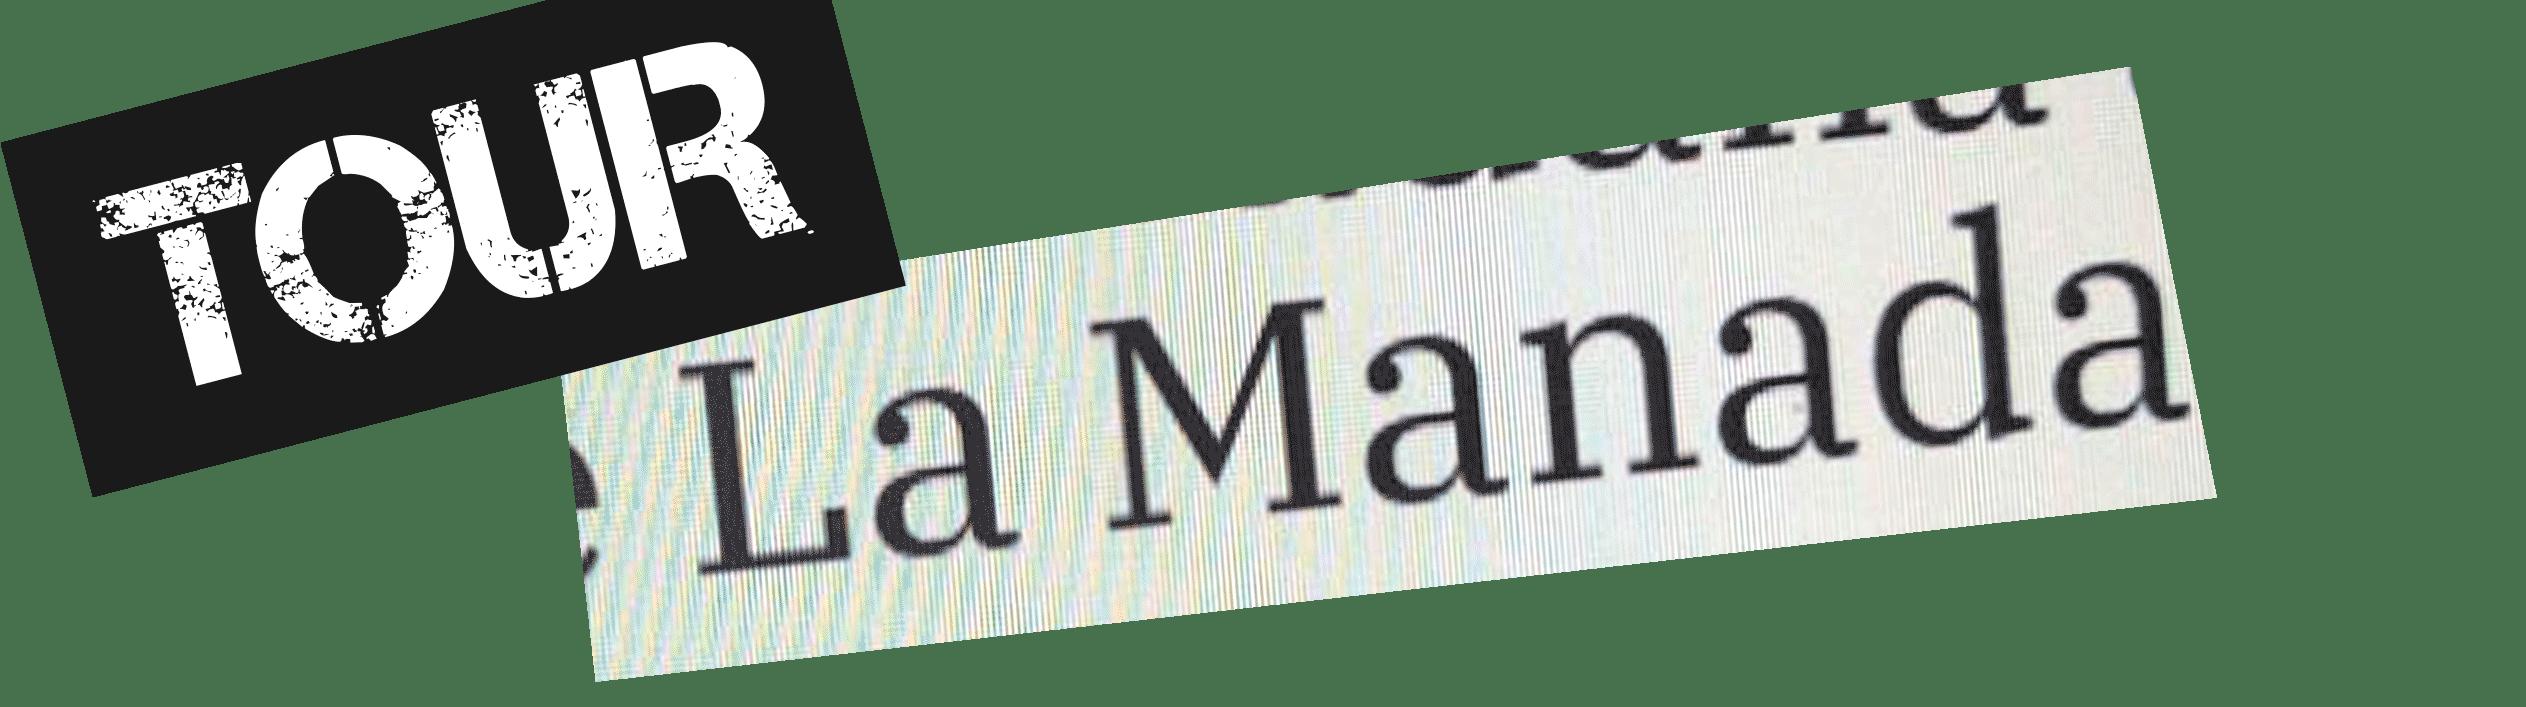 Tour La Manada